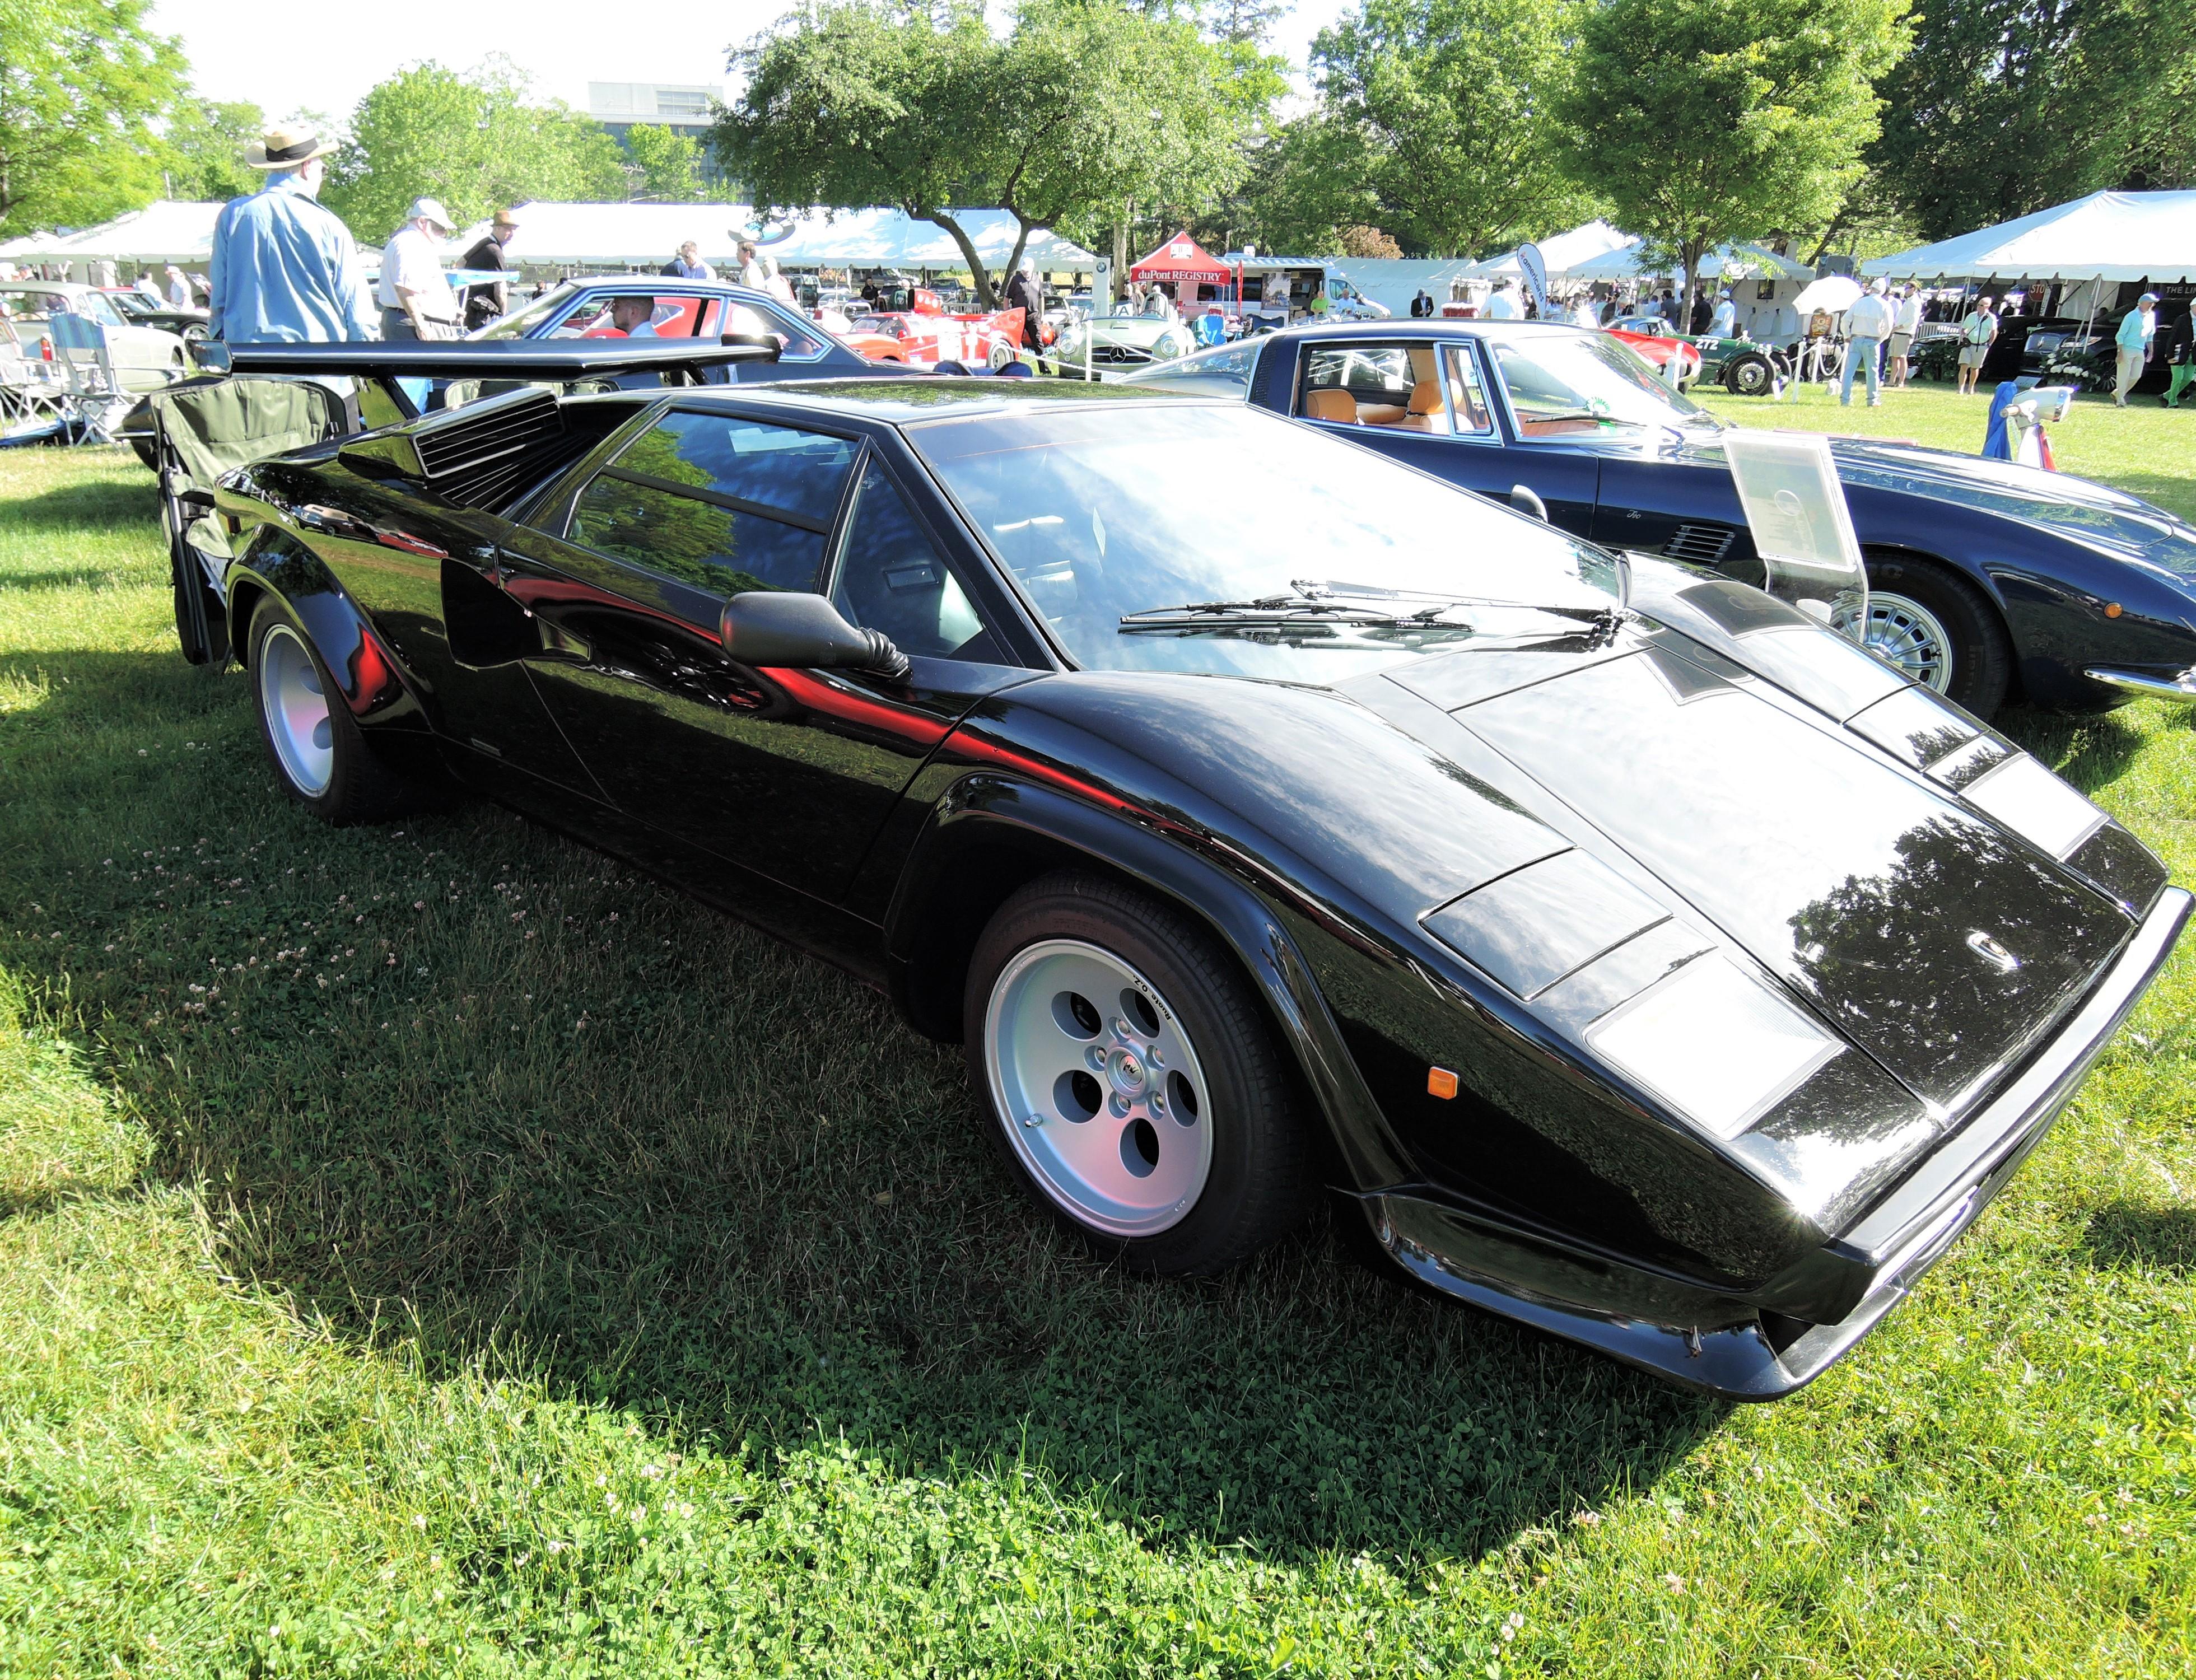 black 1983 Lamborghini Countach Coupe - Greenwich Concours d'Elegance 2017